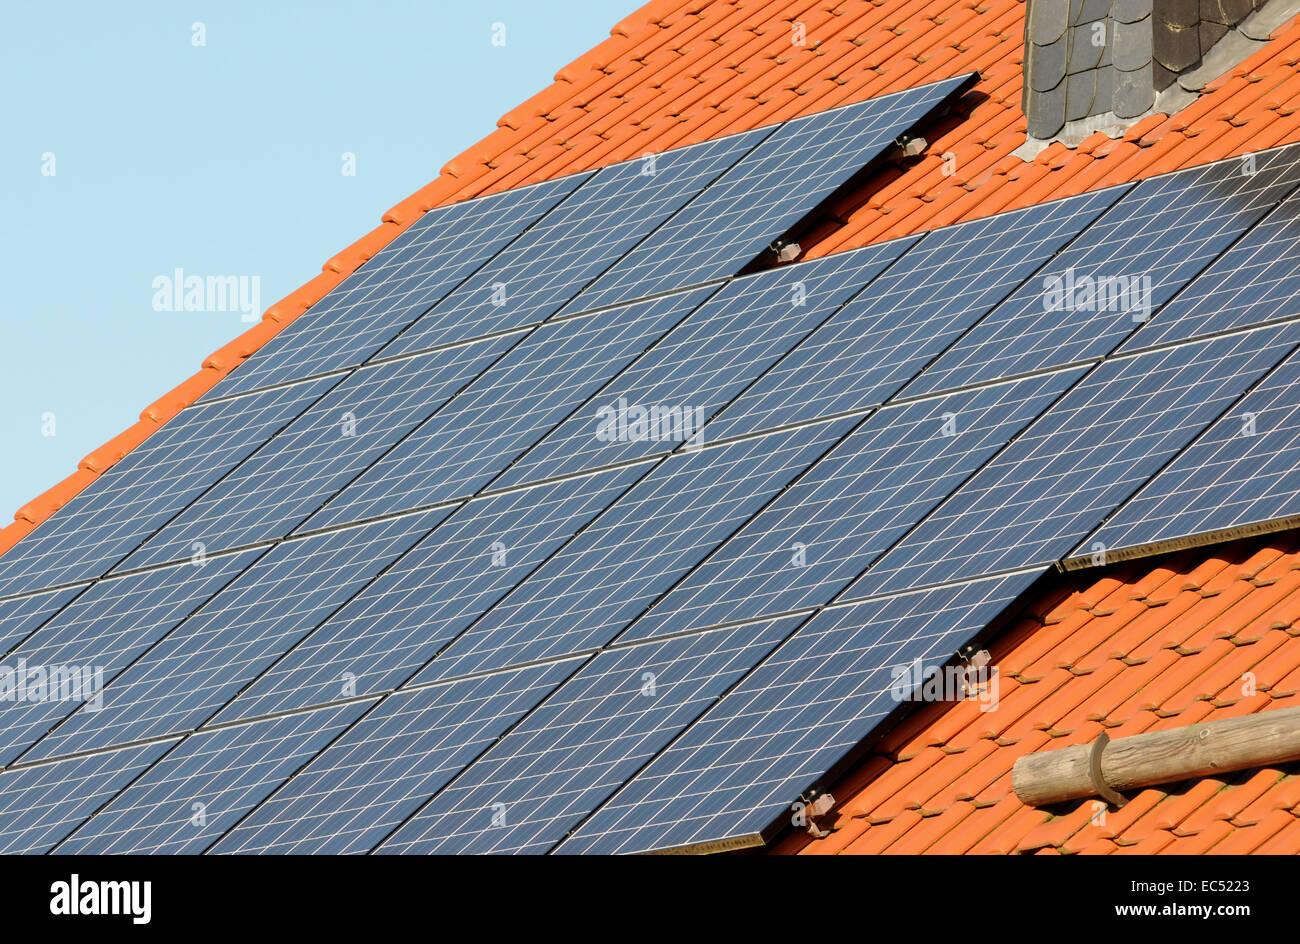 Environmentally friendly energy - Stock Image